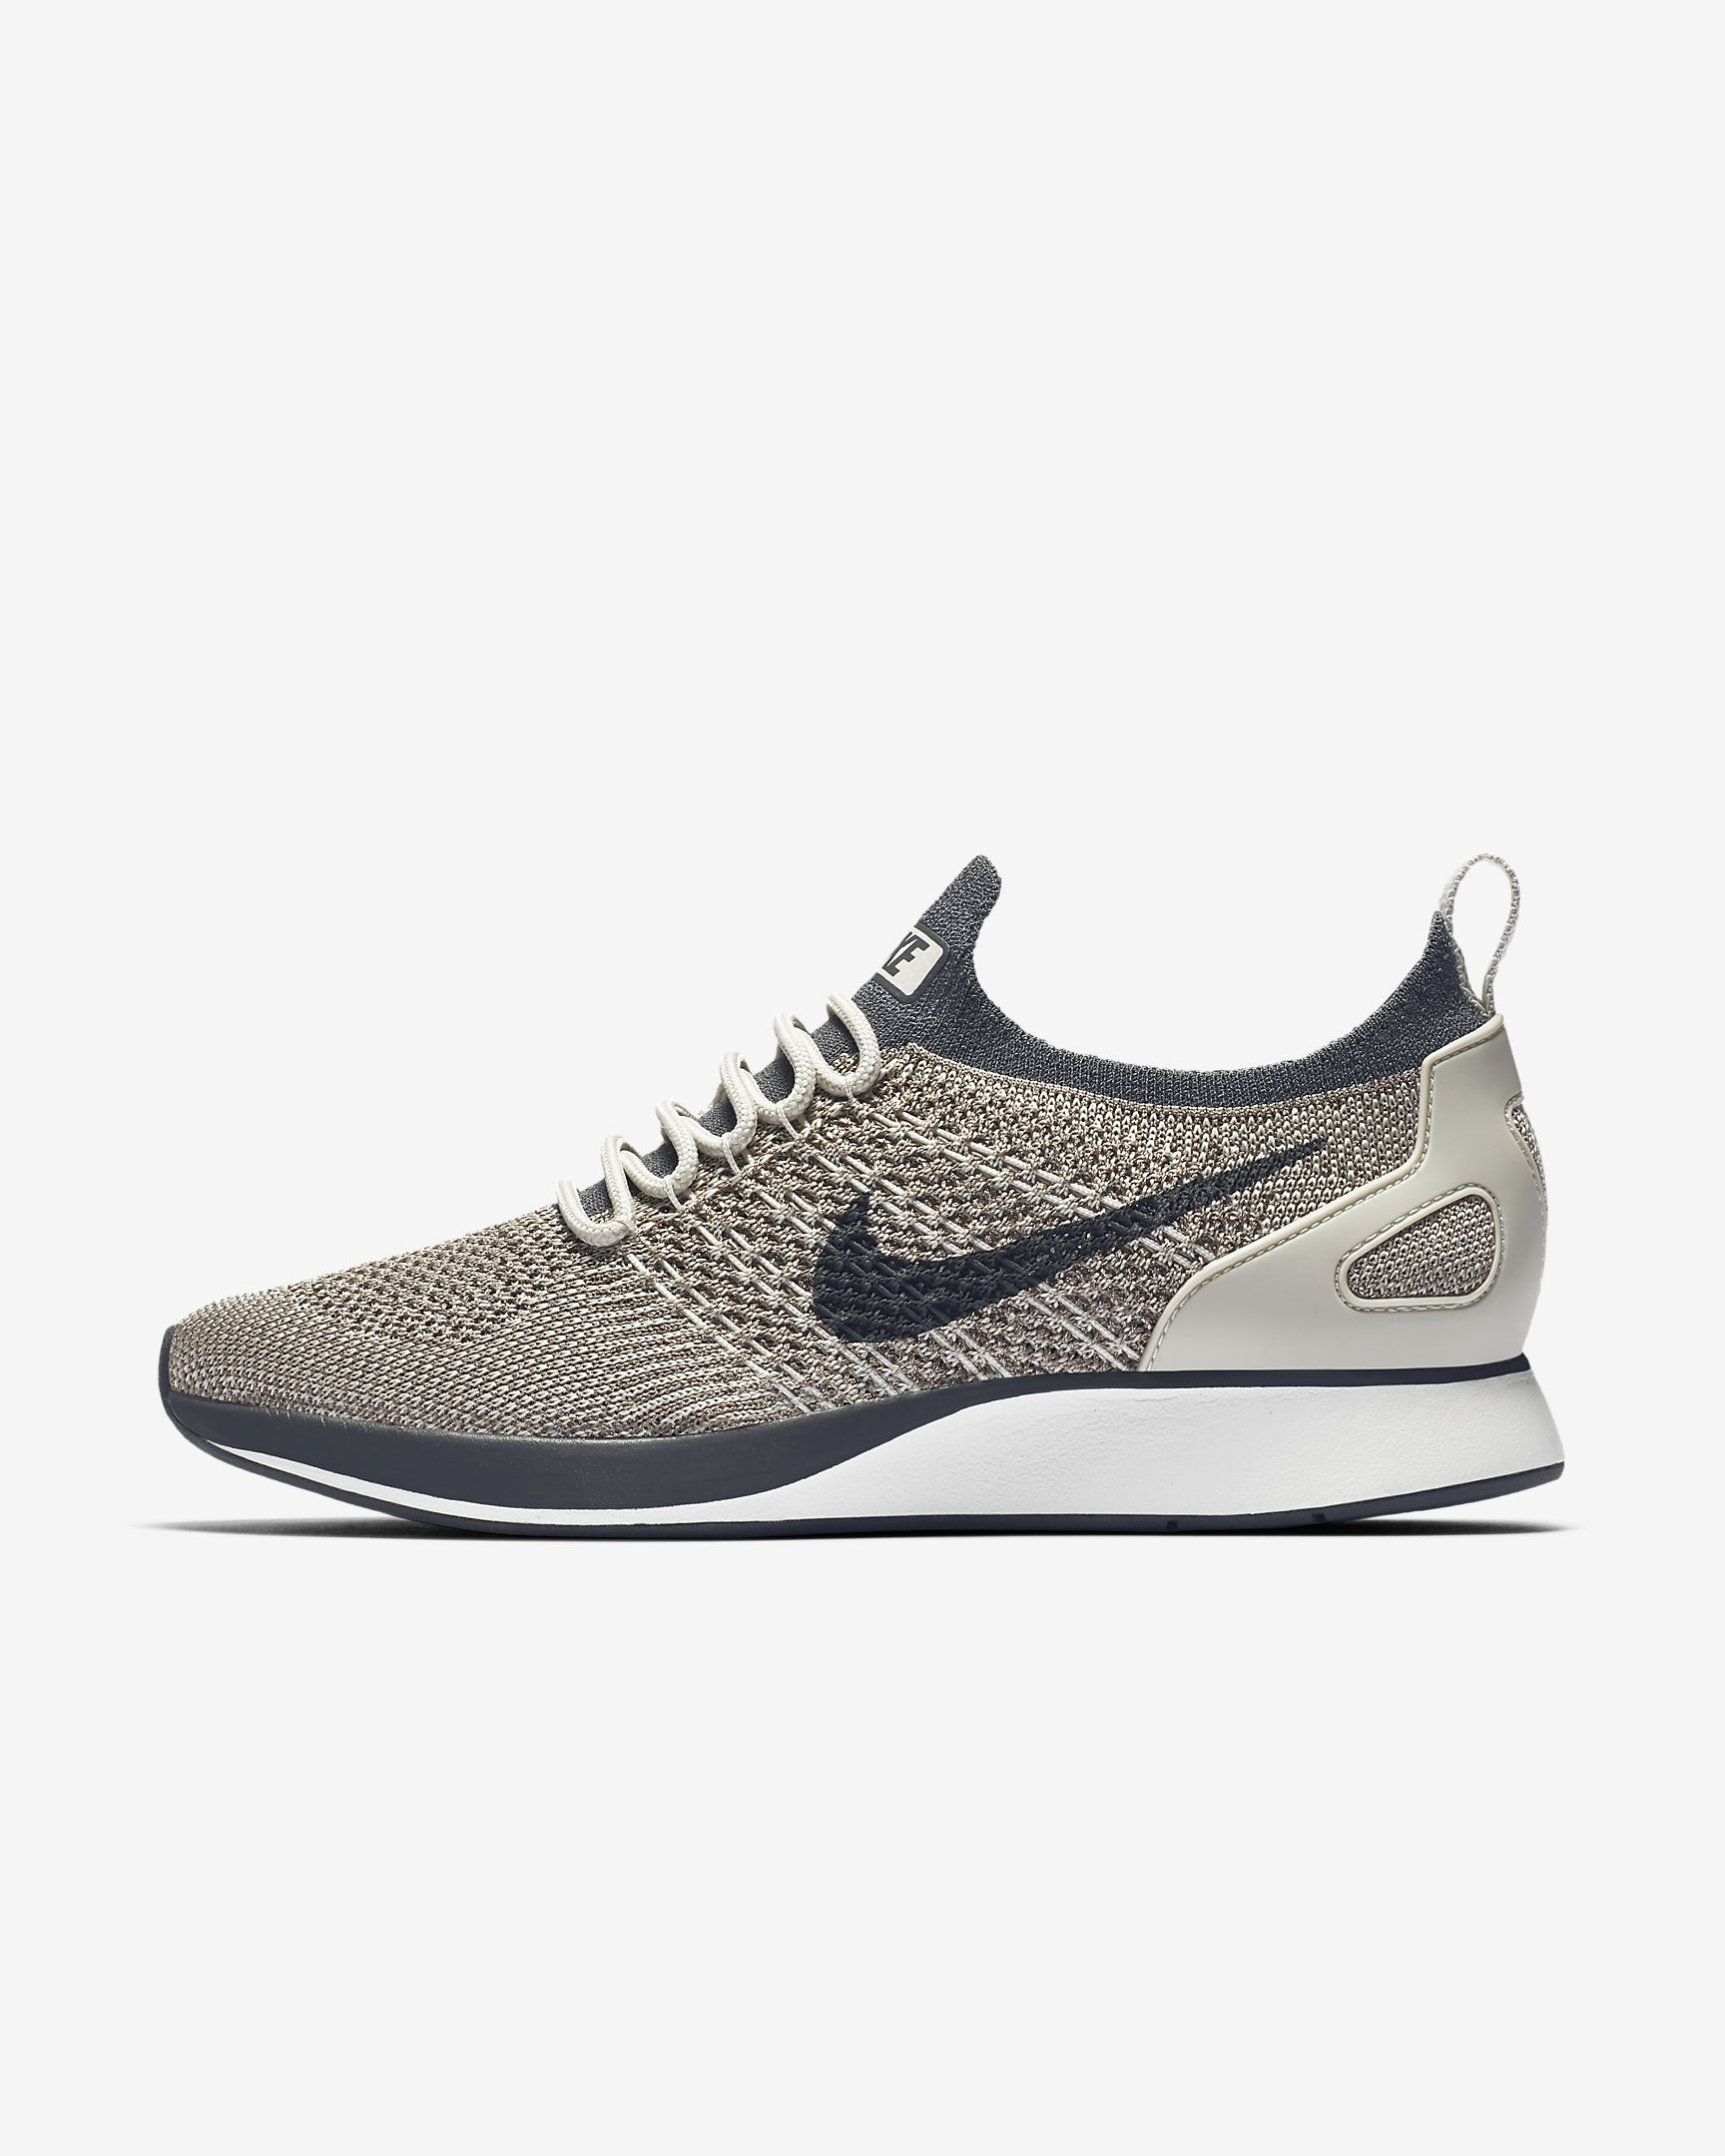 Nike Air Zoom Mariah Flyknit Racer Women S Shoe Flyknit Racer Women Nike Sneakers Nike